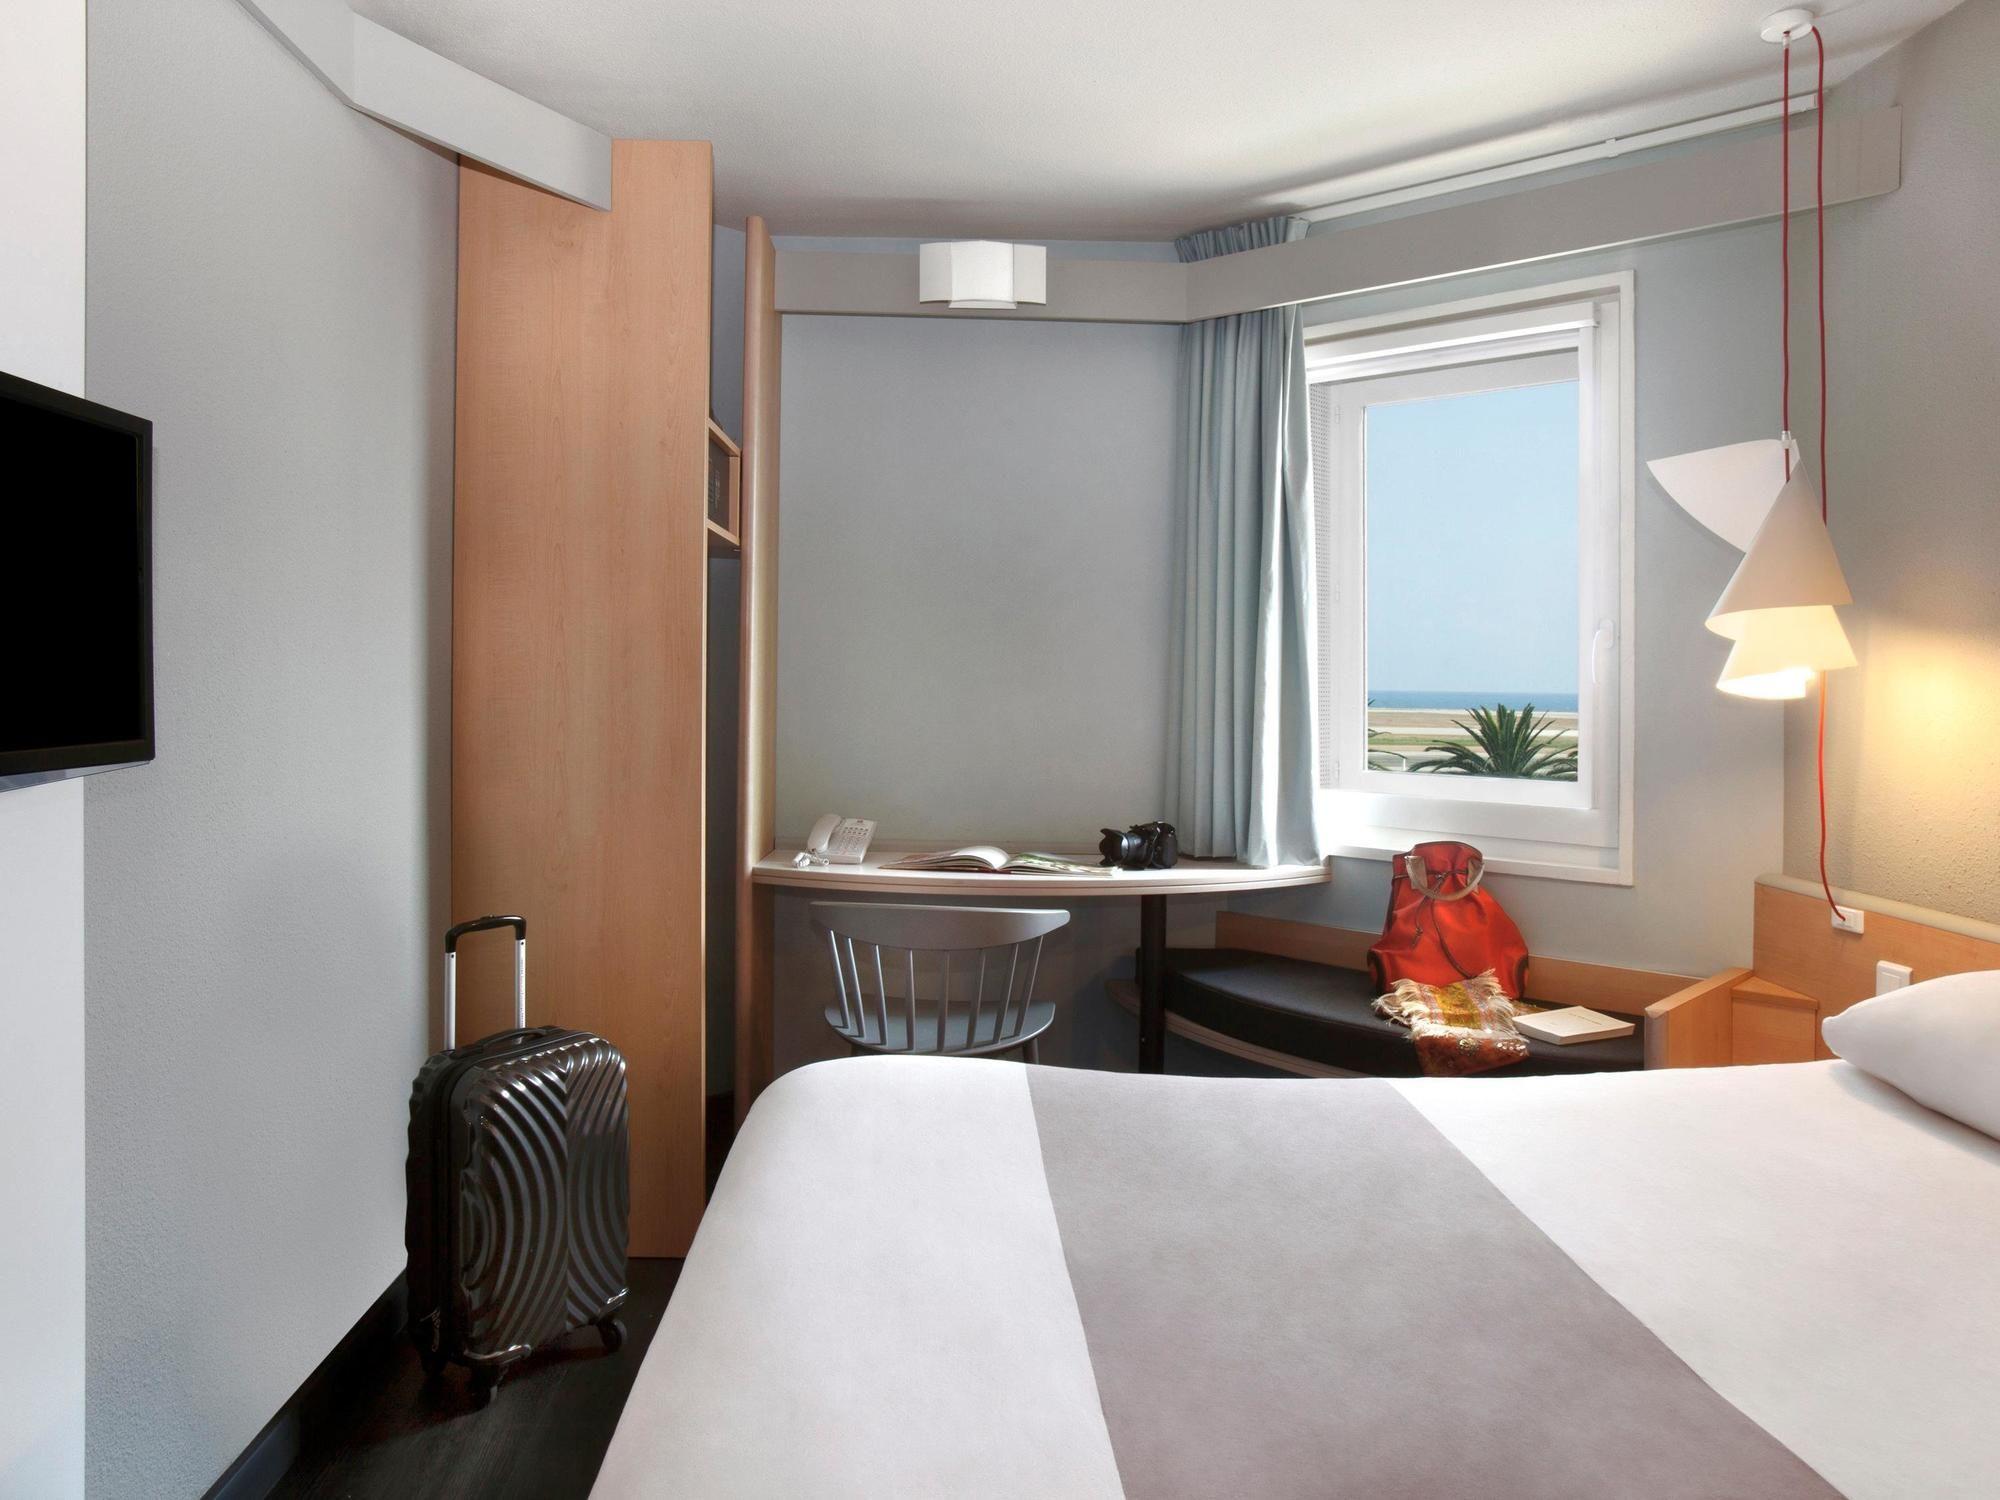 ibis Nice Aeroport Promenade Hotel